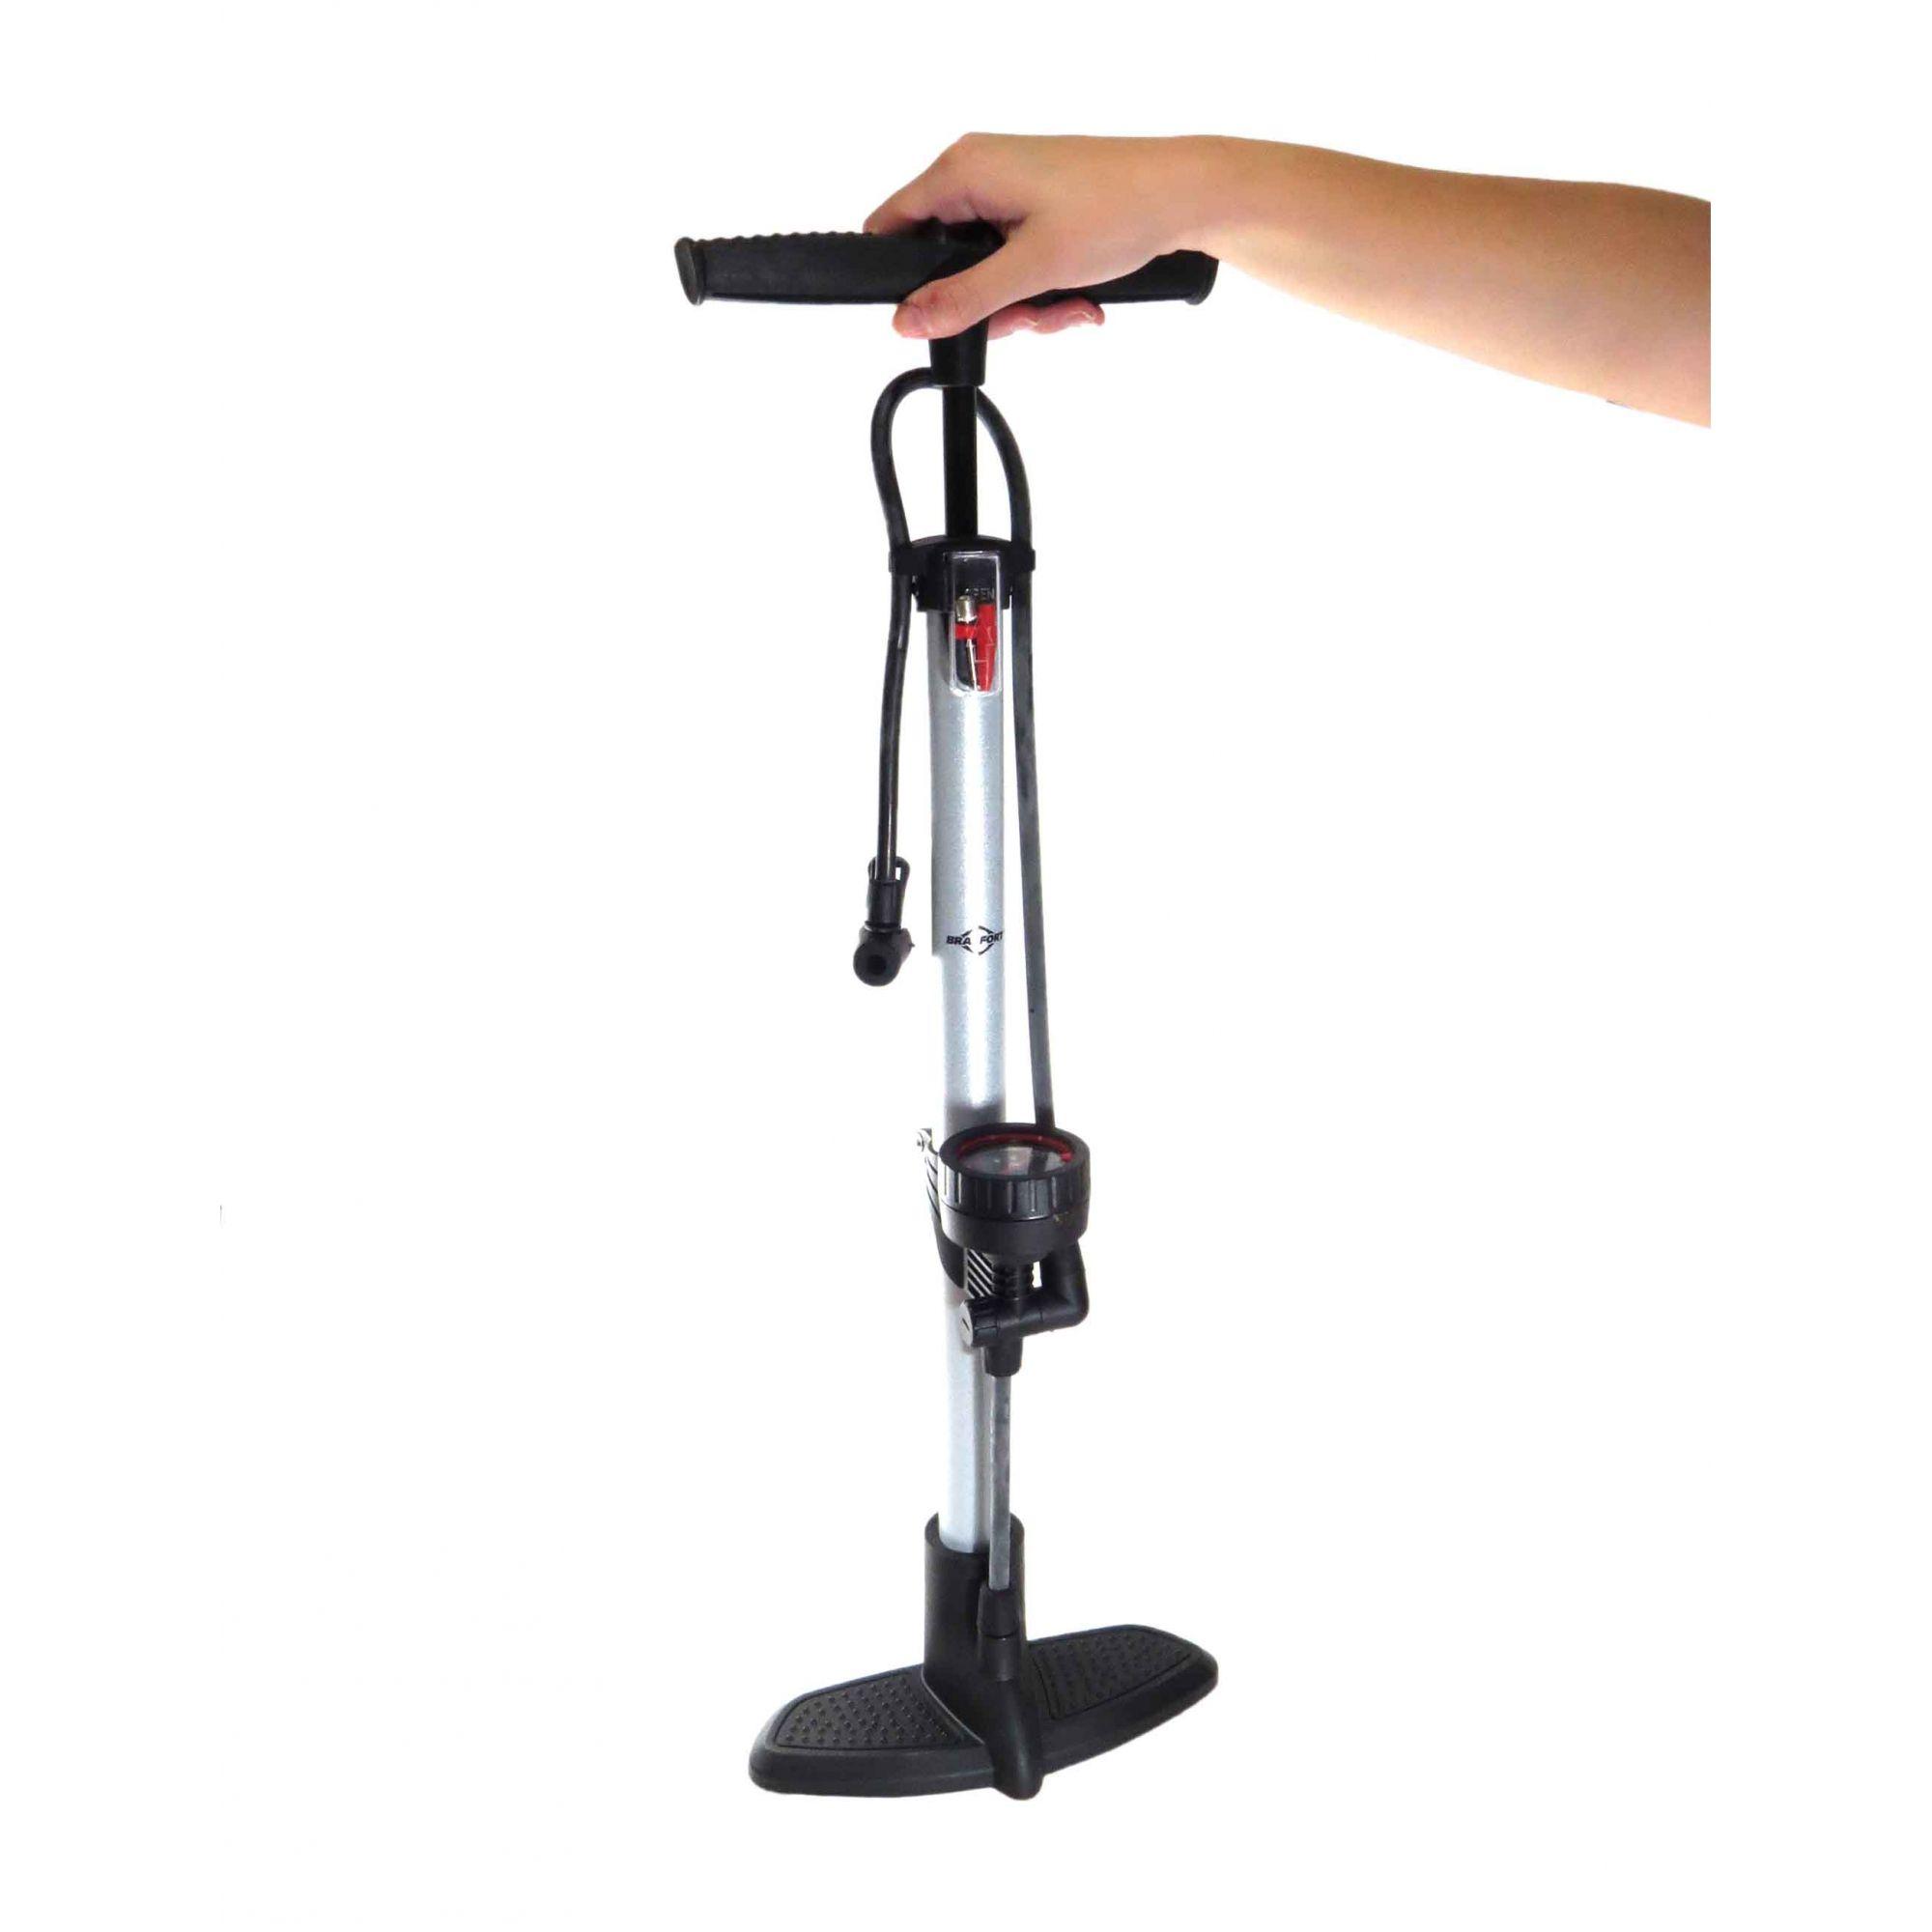 Jogo Bicicleta Bomba de Ar Manual Chave de Boca Capa E Trava